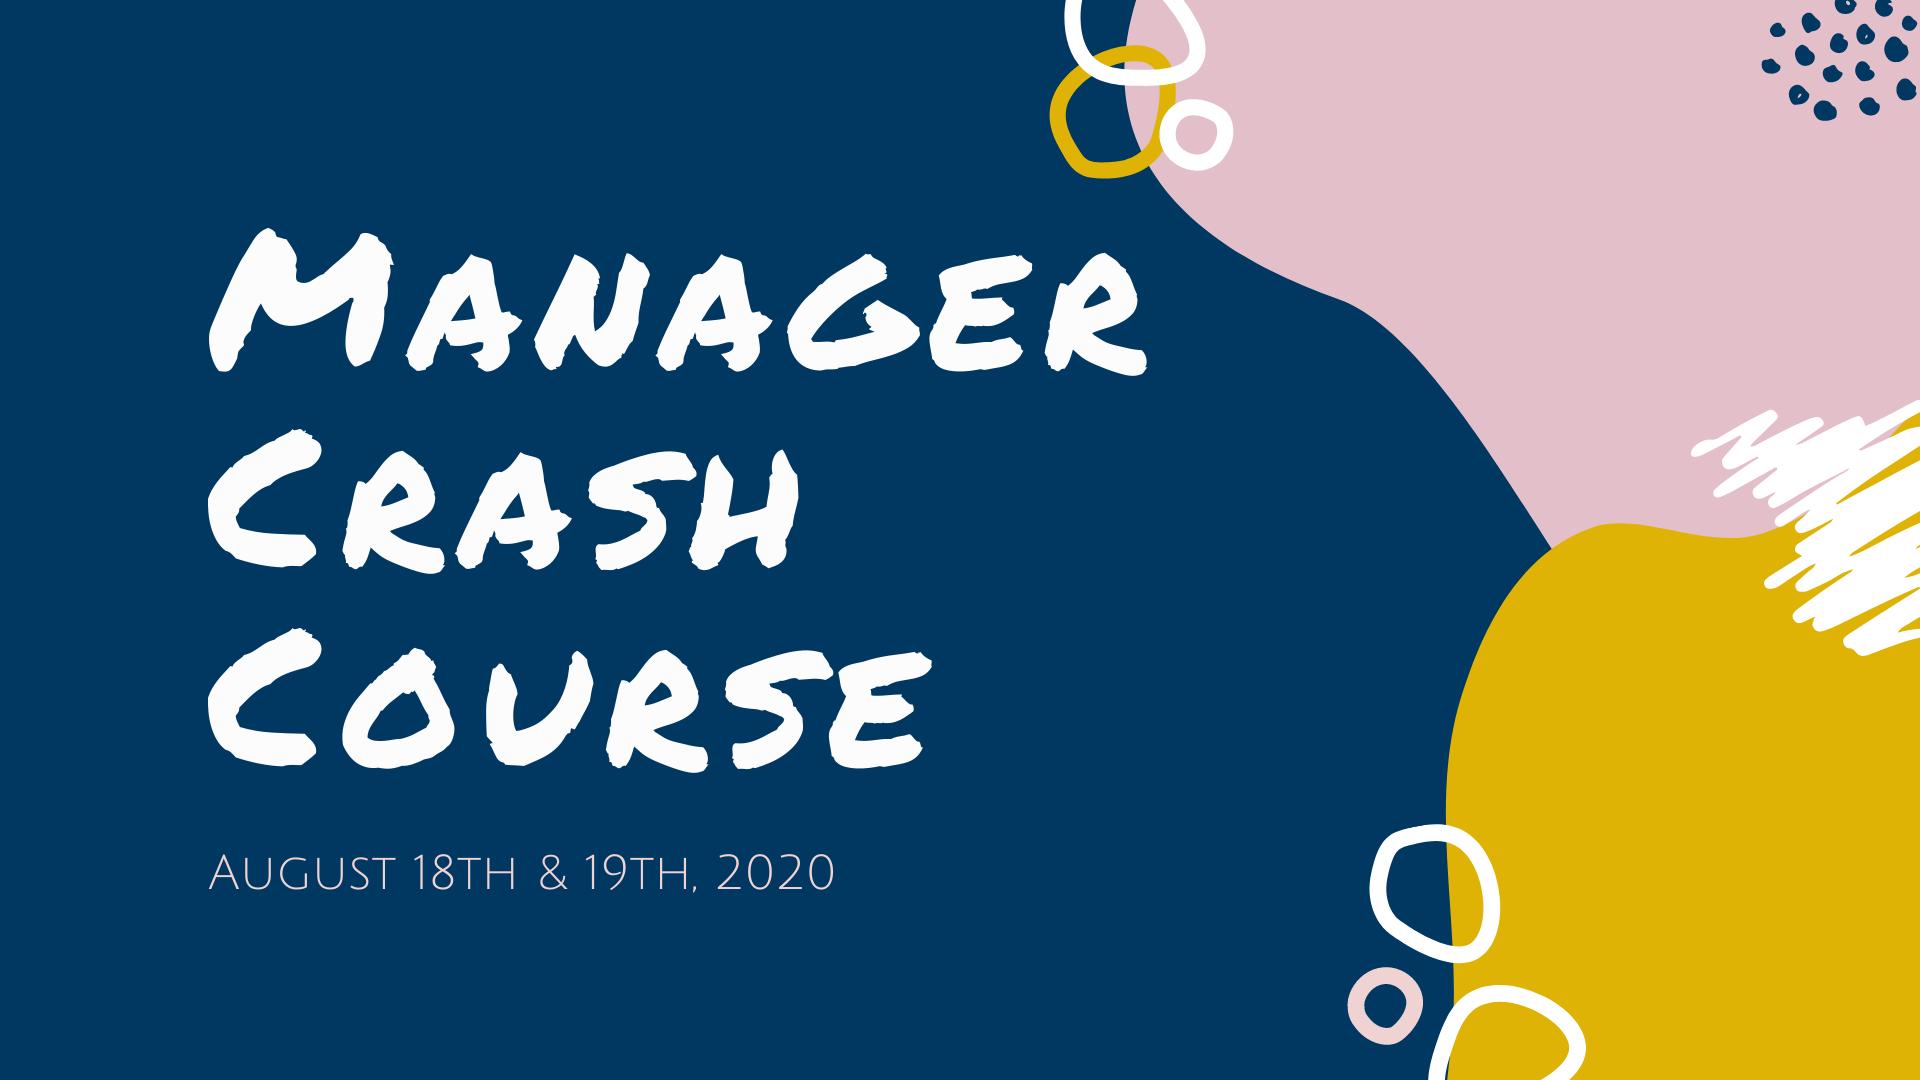 Manager Crash Course August 2020